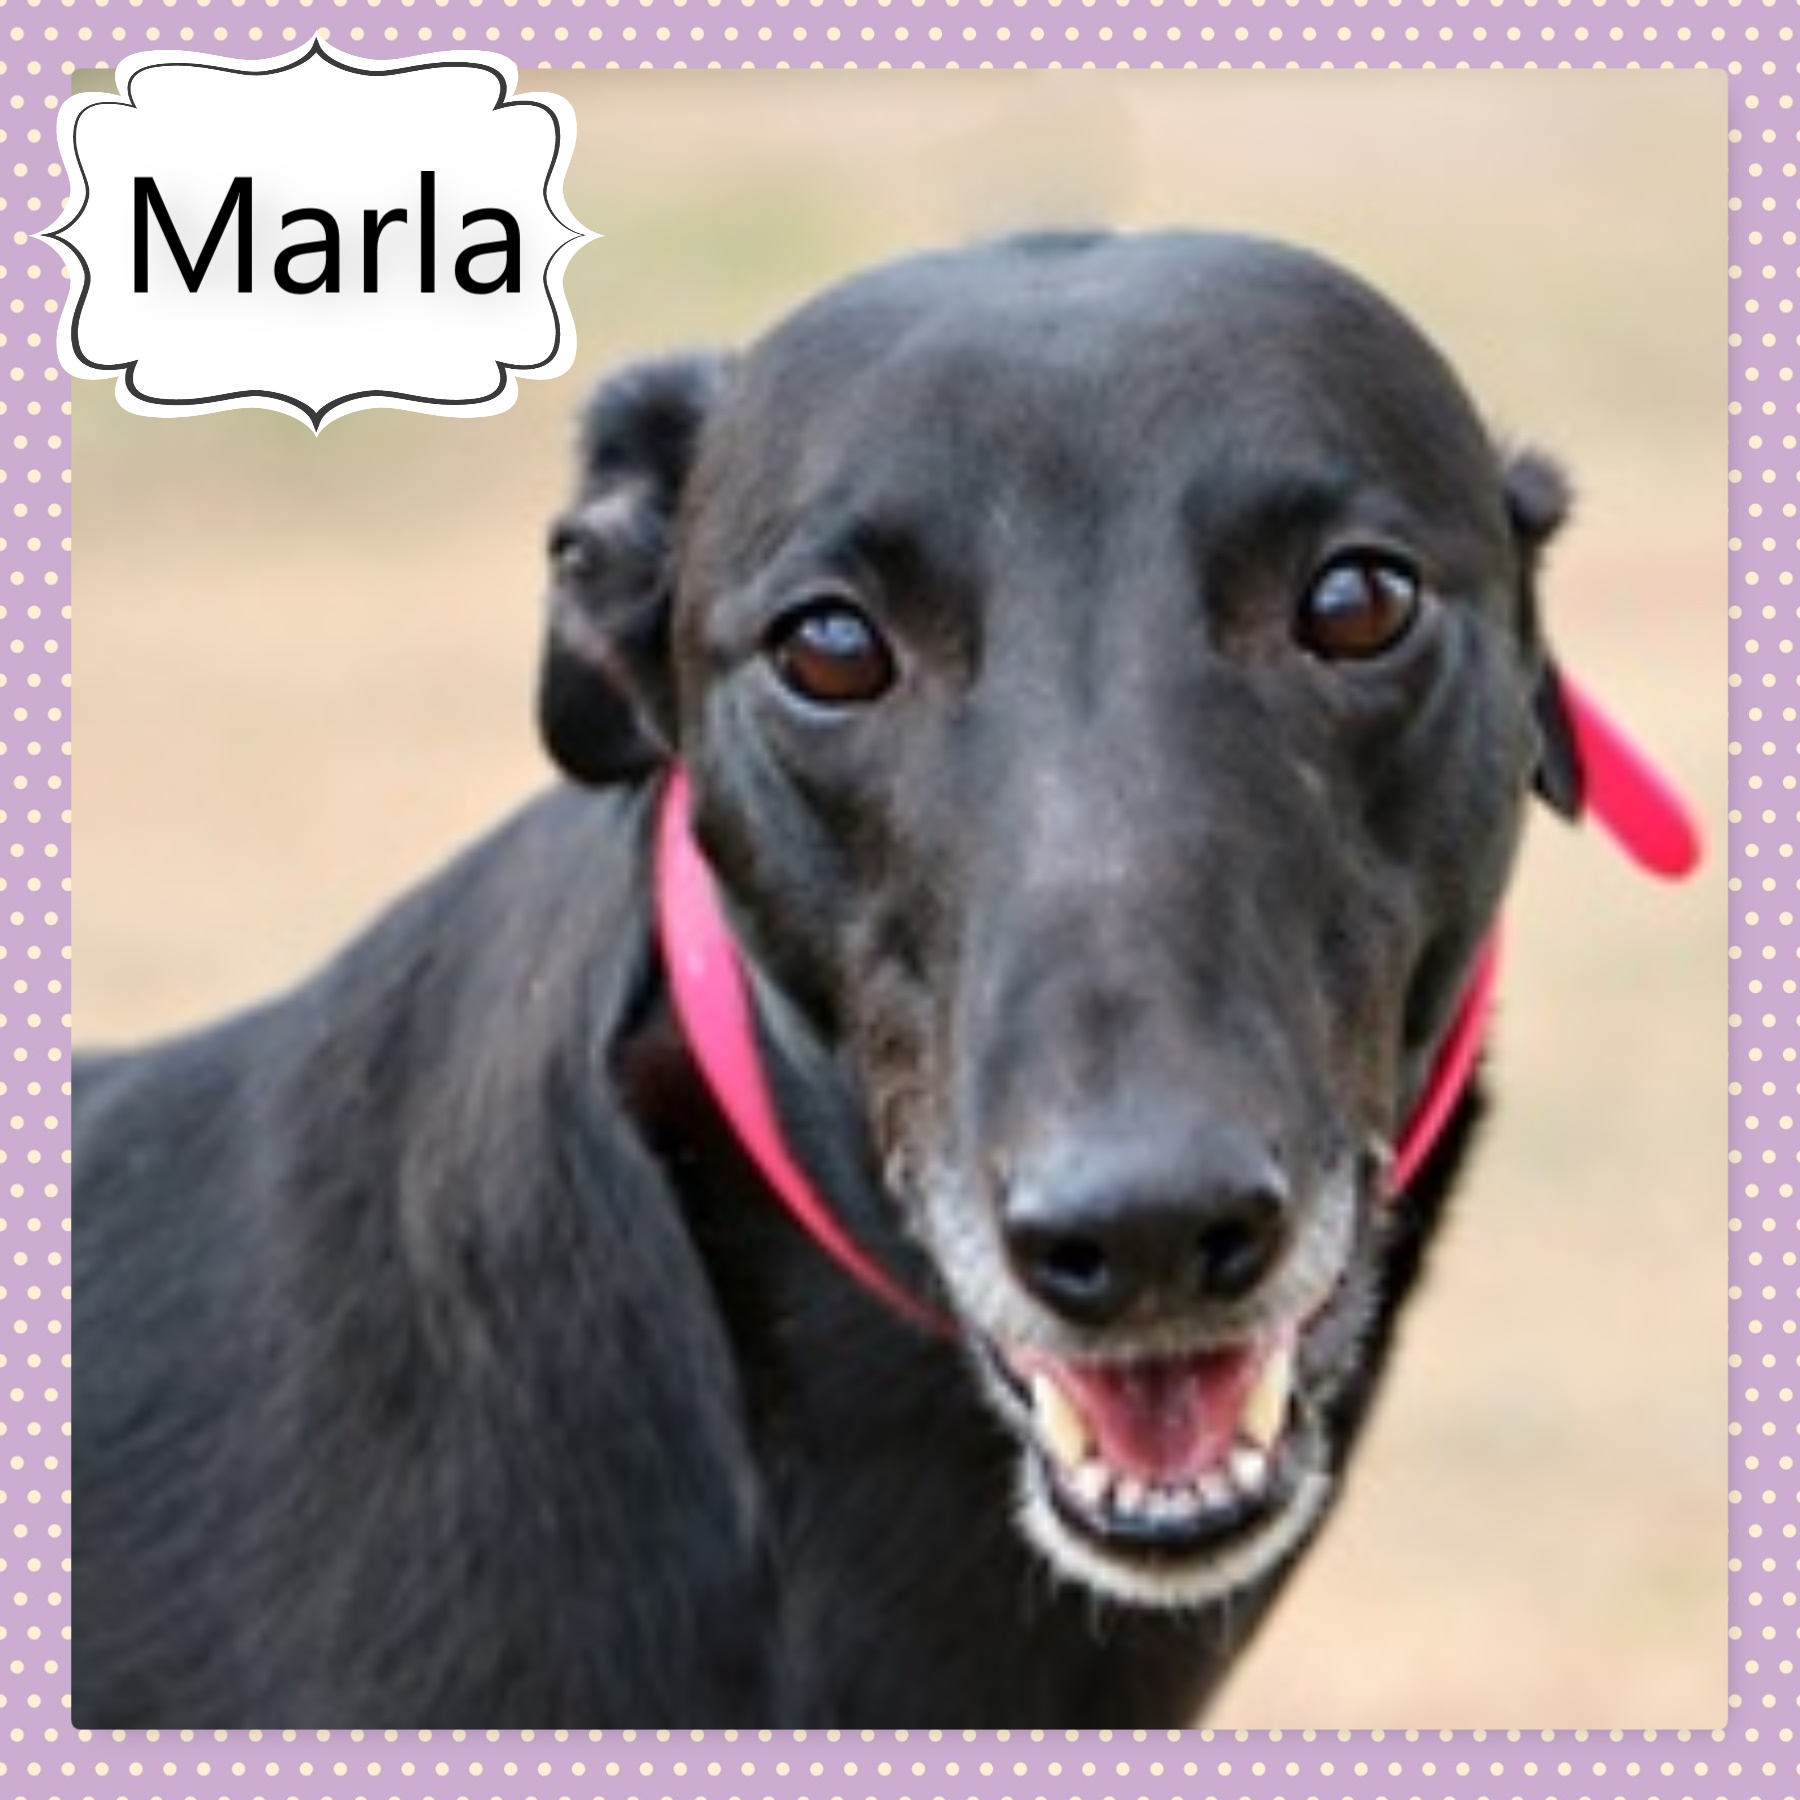 Marla (Marla's Goddess)